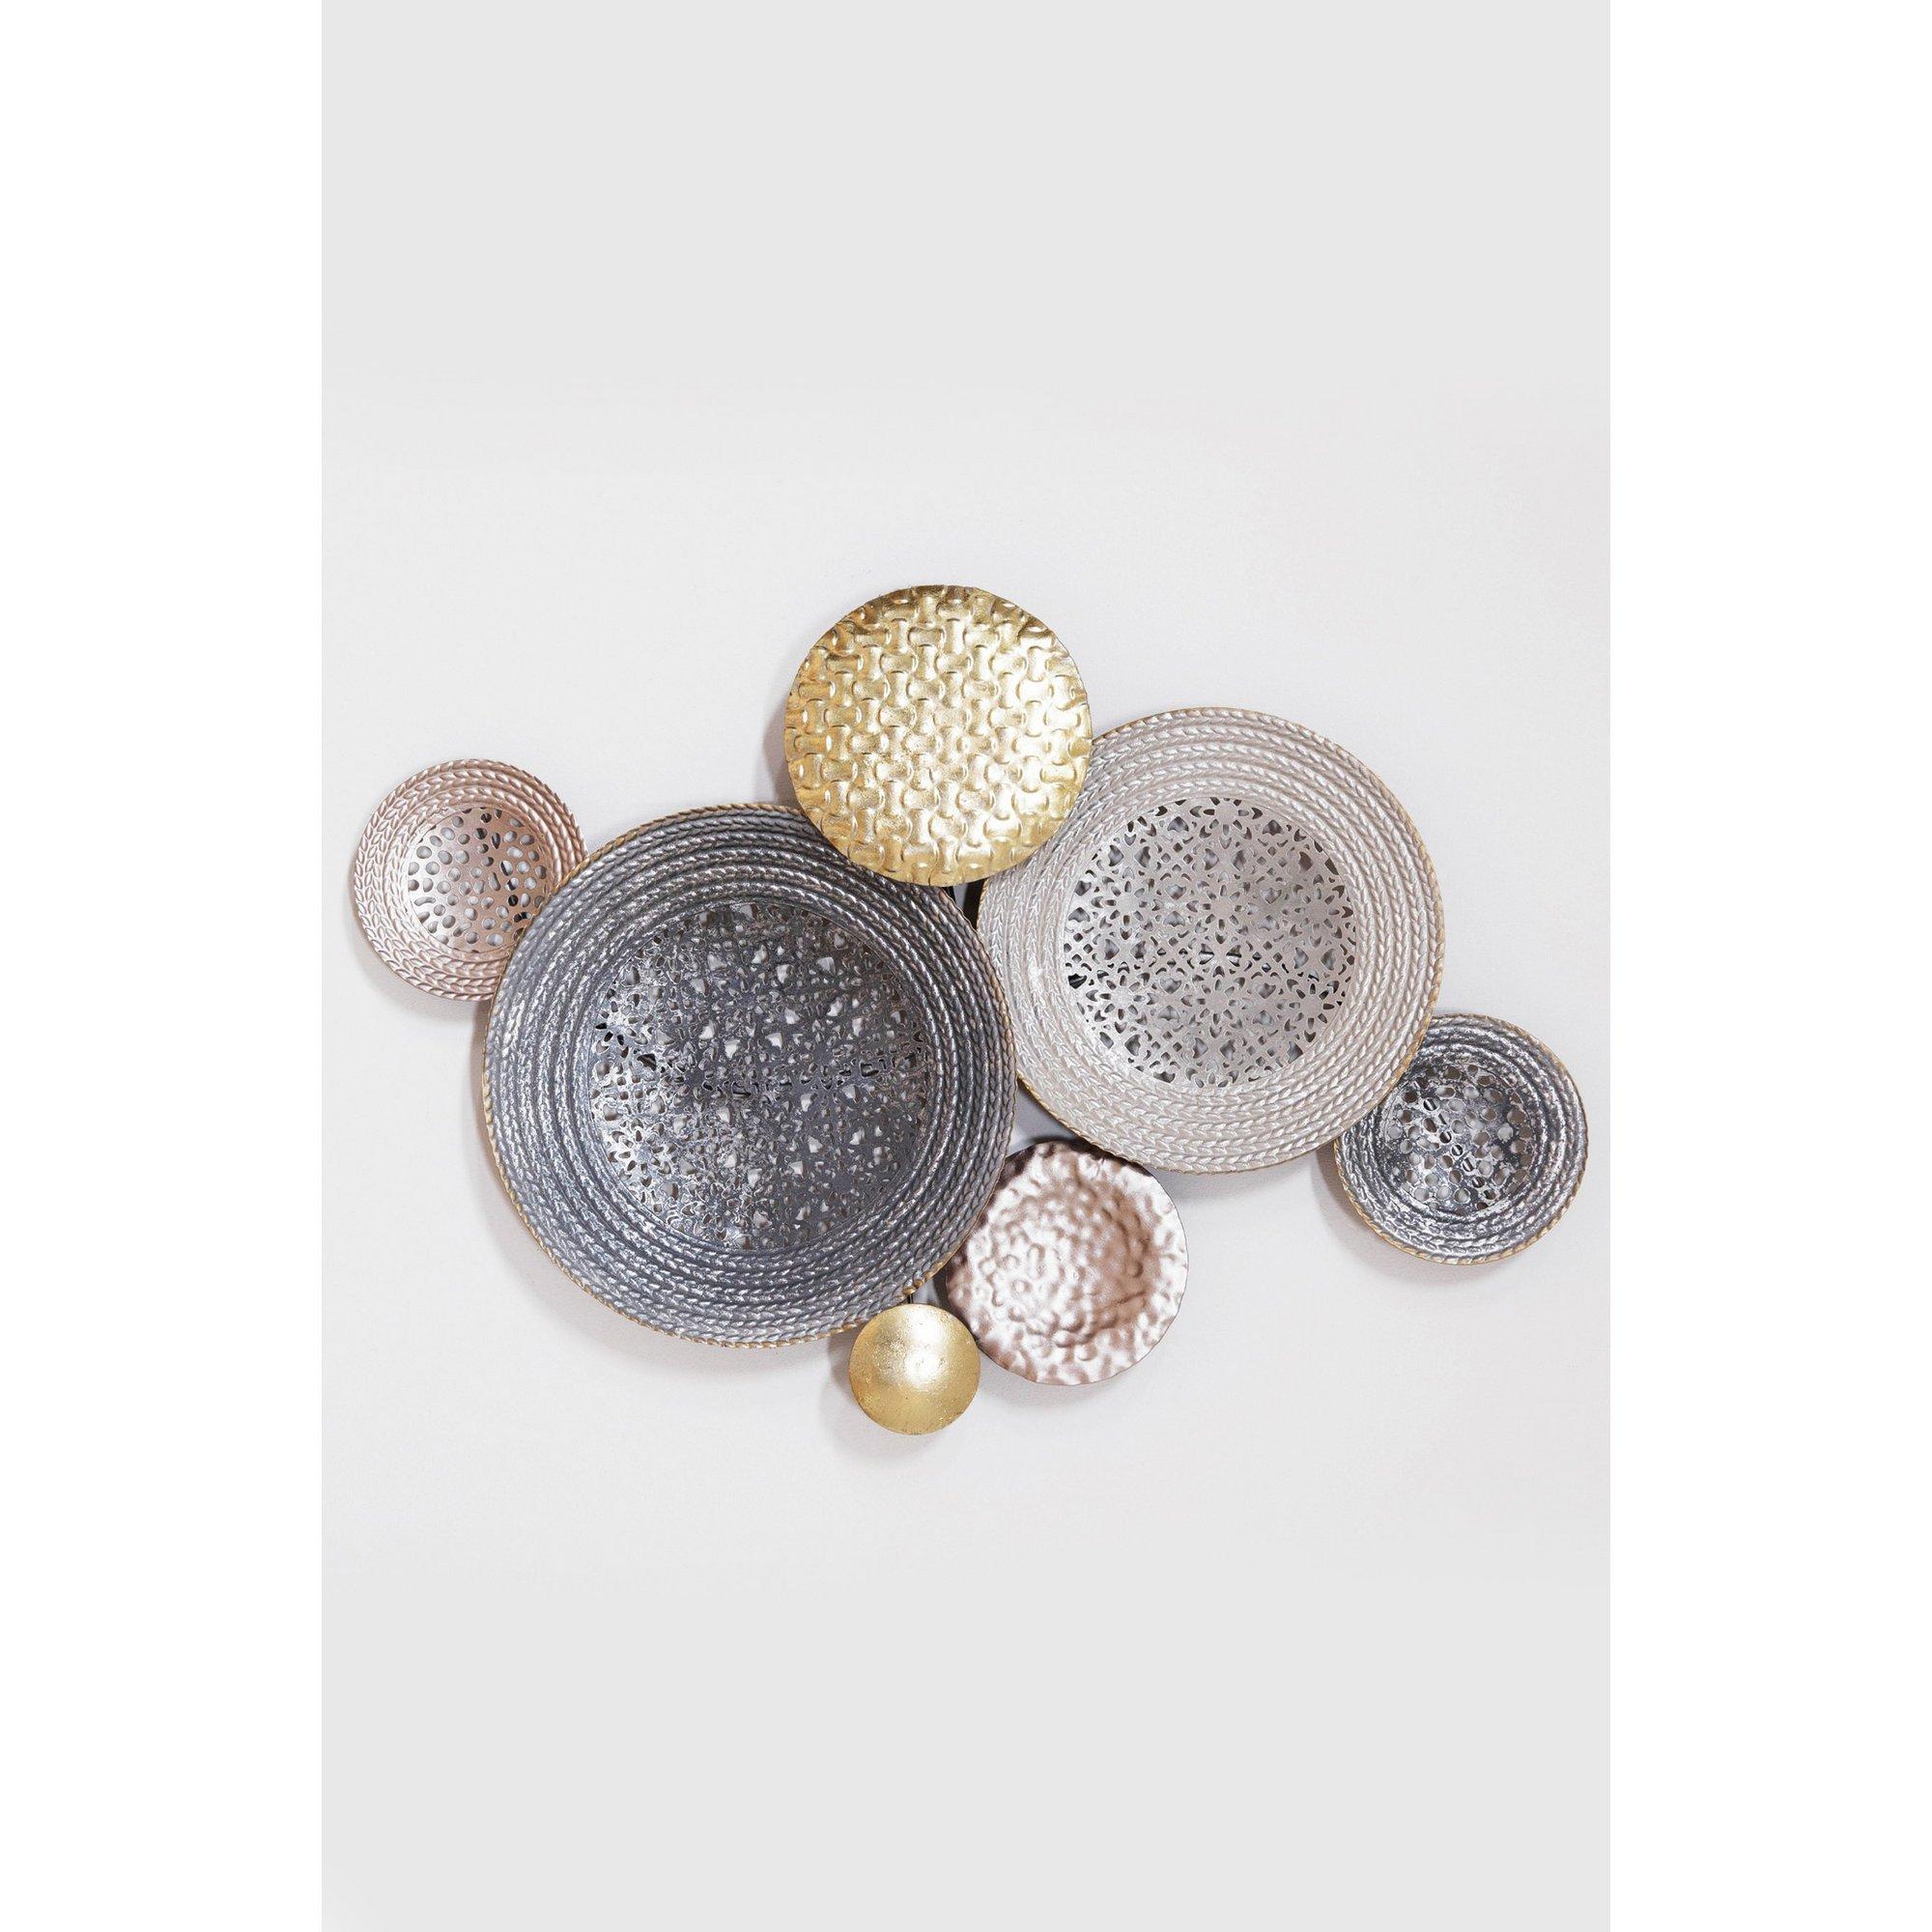 Image of Circular Design Metal Wall Art